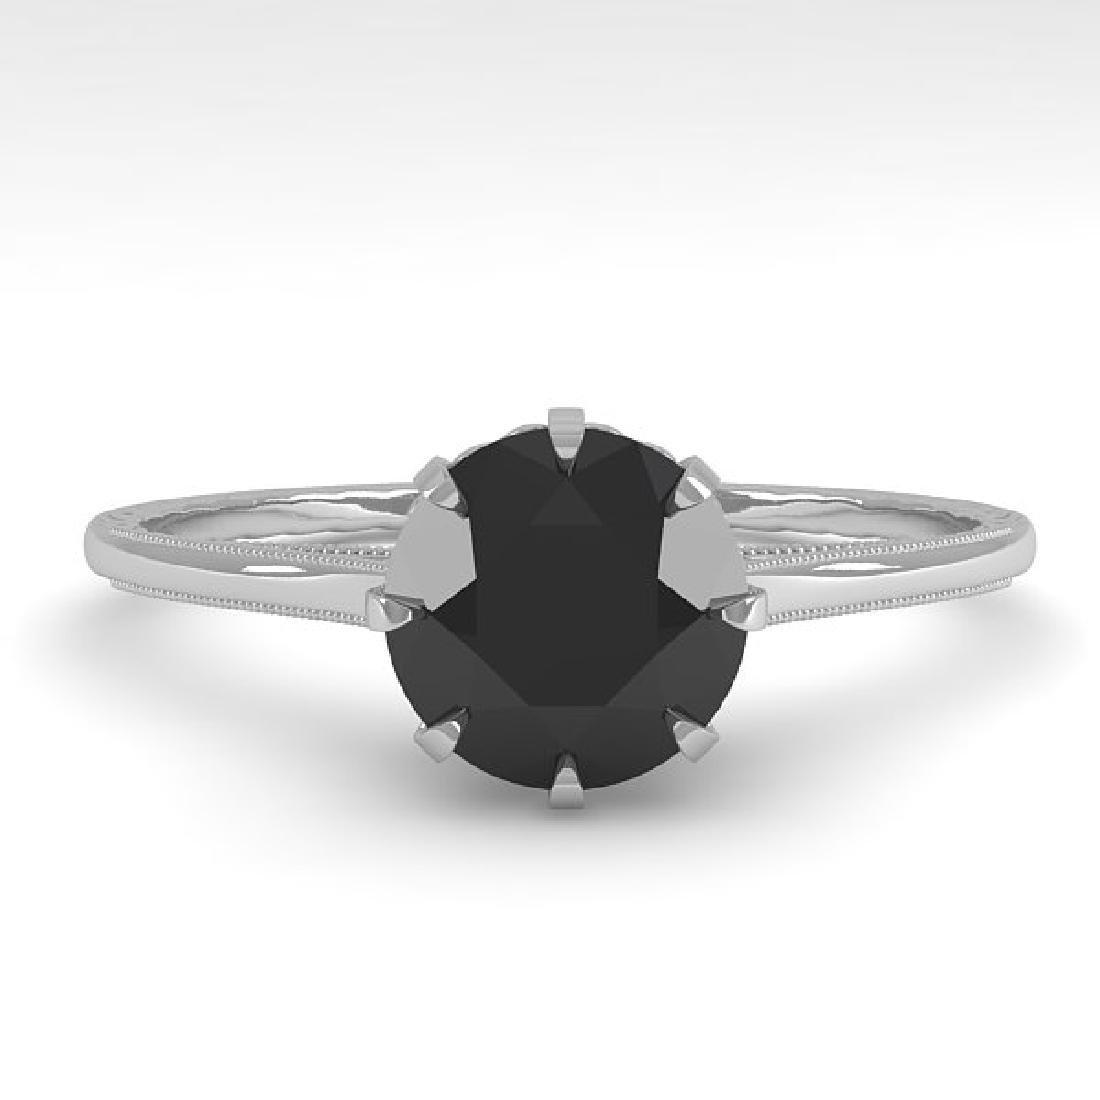 1.0 CTW Black Diamond Solitaire Ring Vintage 14K White